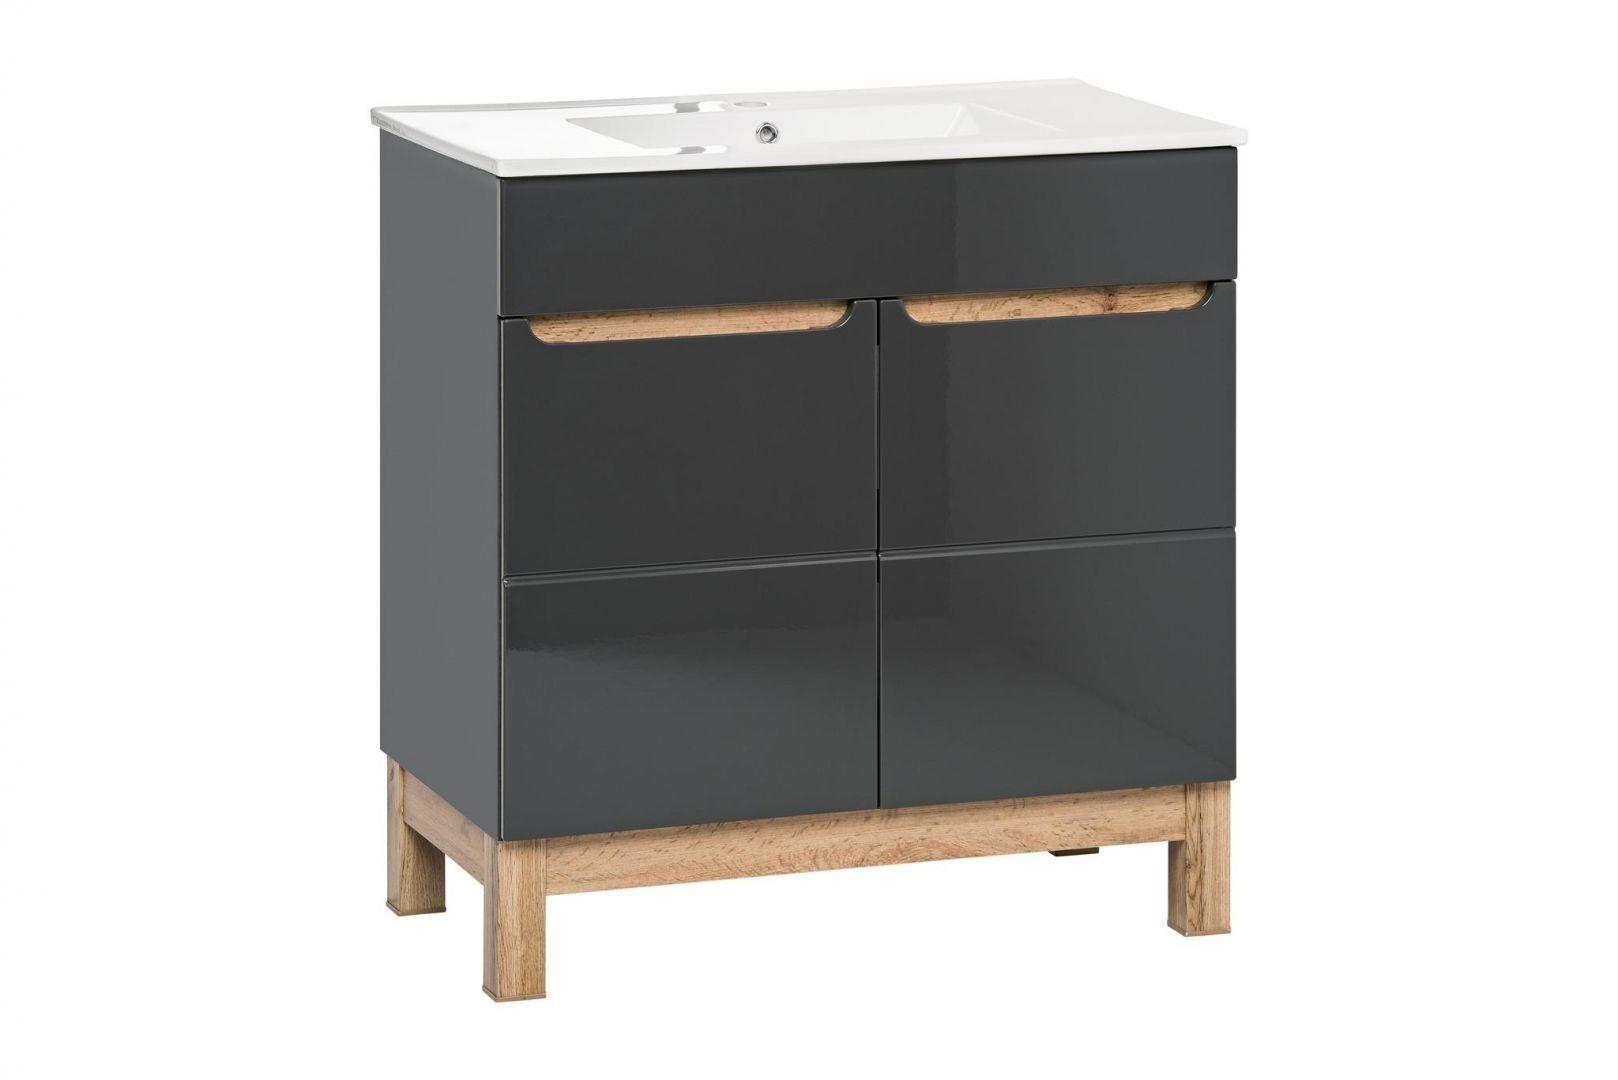 Koupelnová sestava BALLI GREY 150